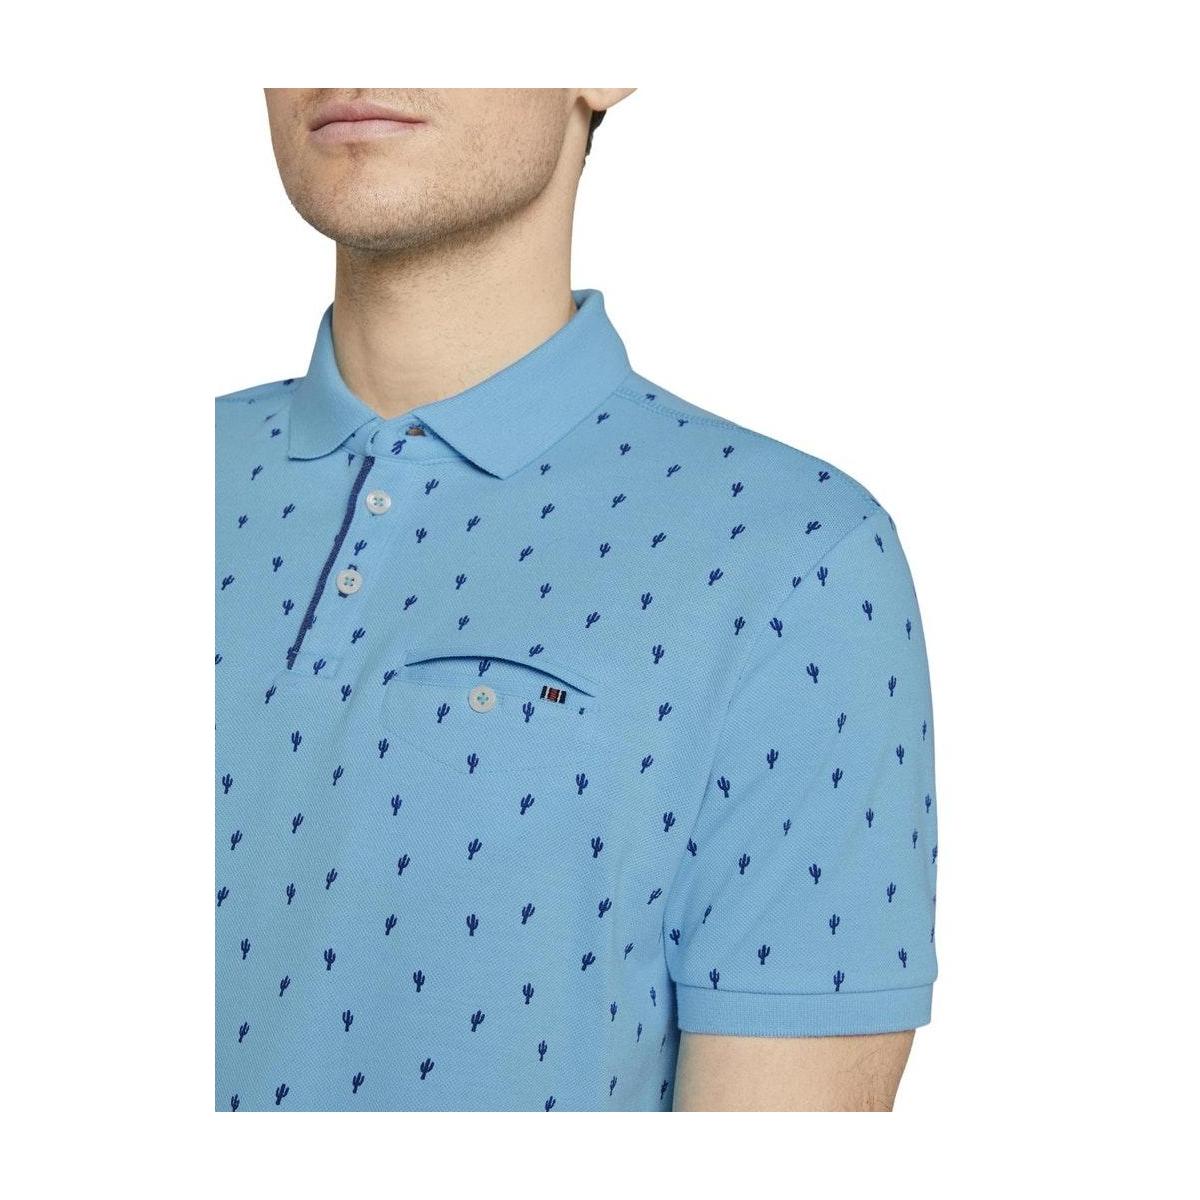 polo met cactus patroon 1019676xx10 tom tailor polo 23408